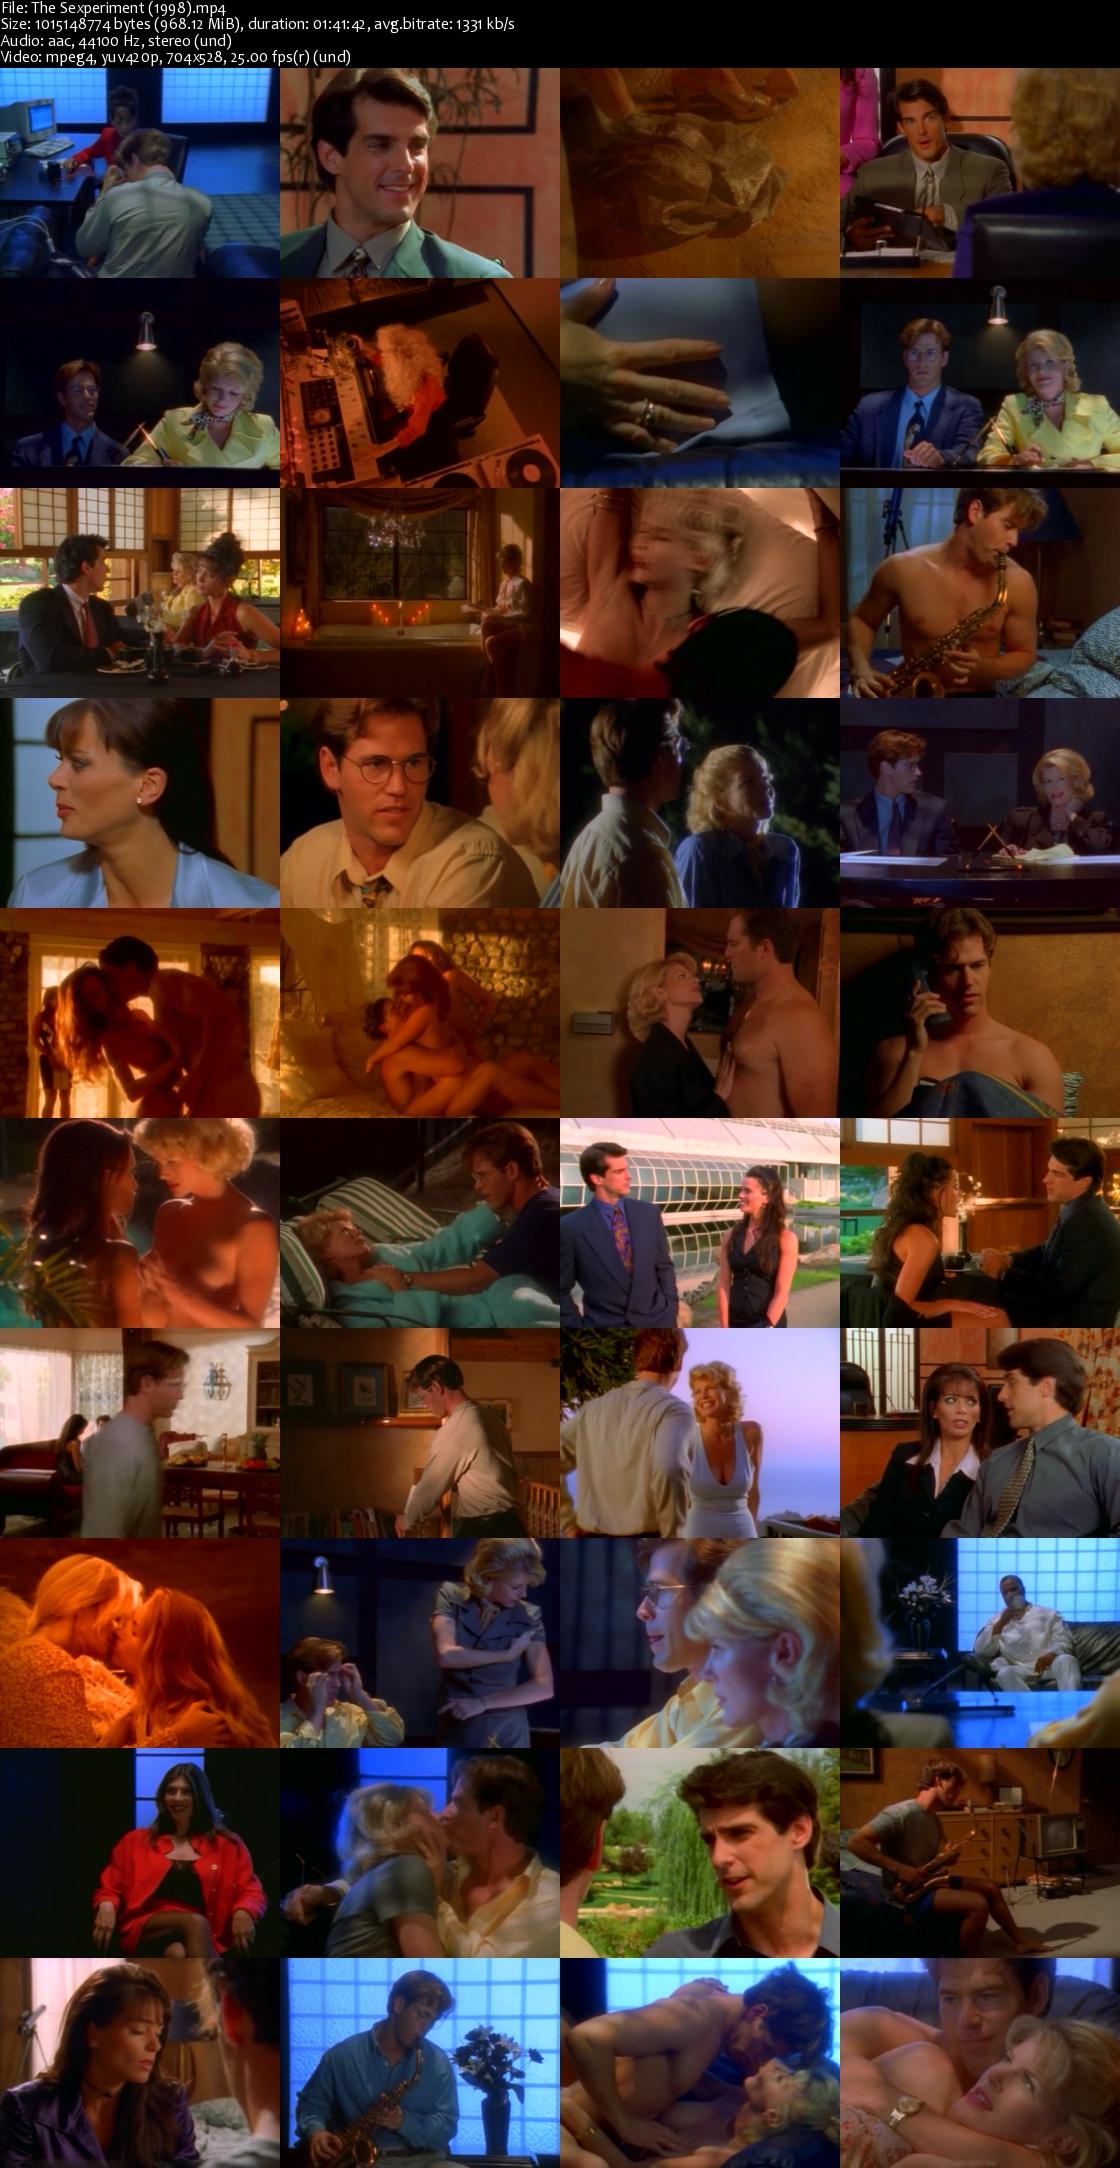 the_sexperiment_1998